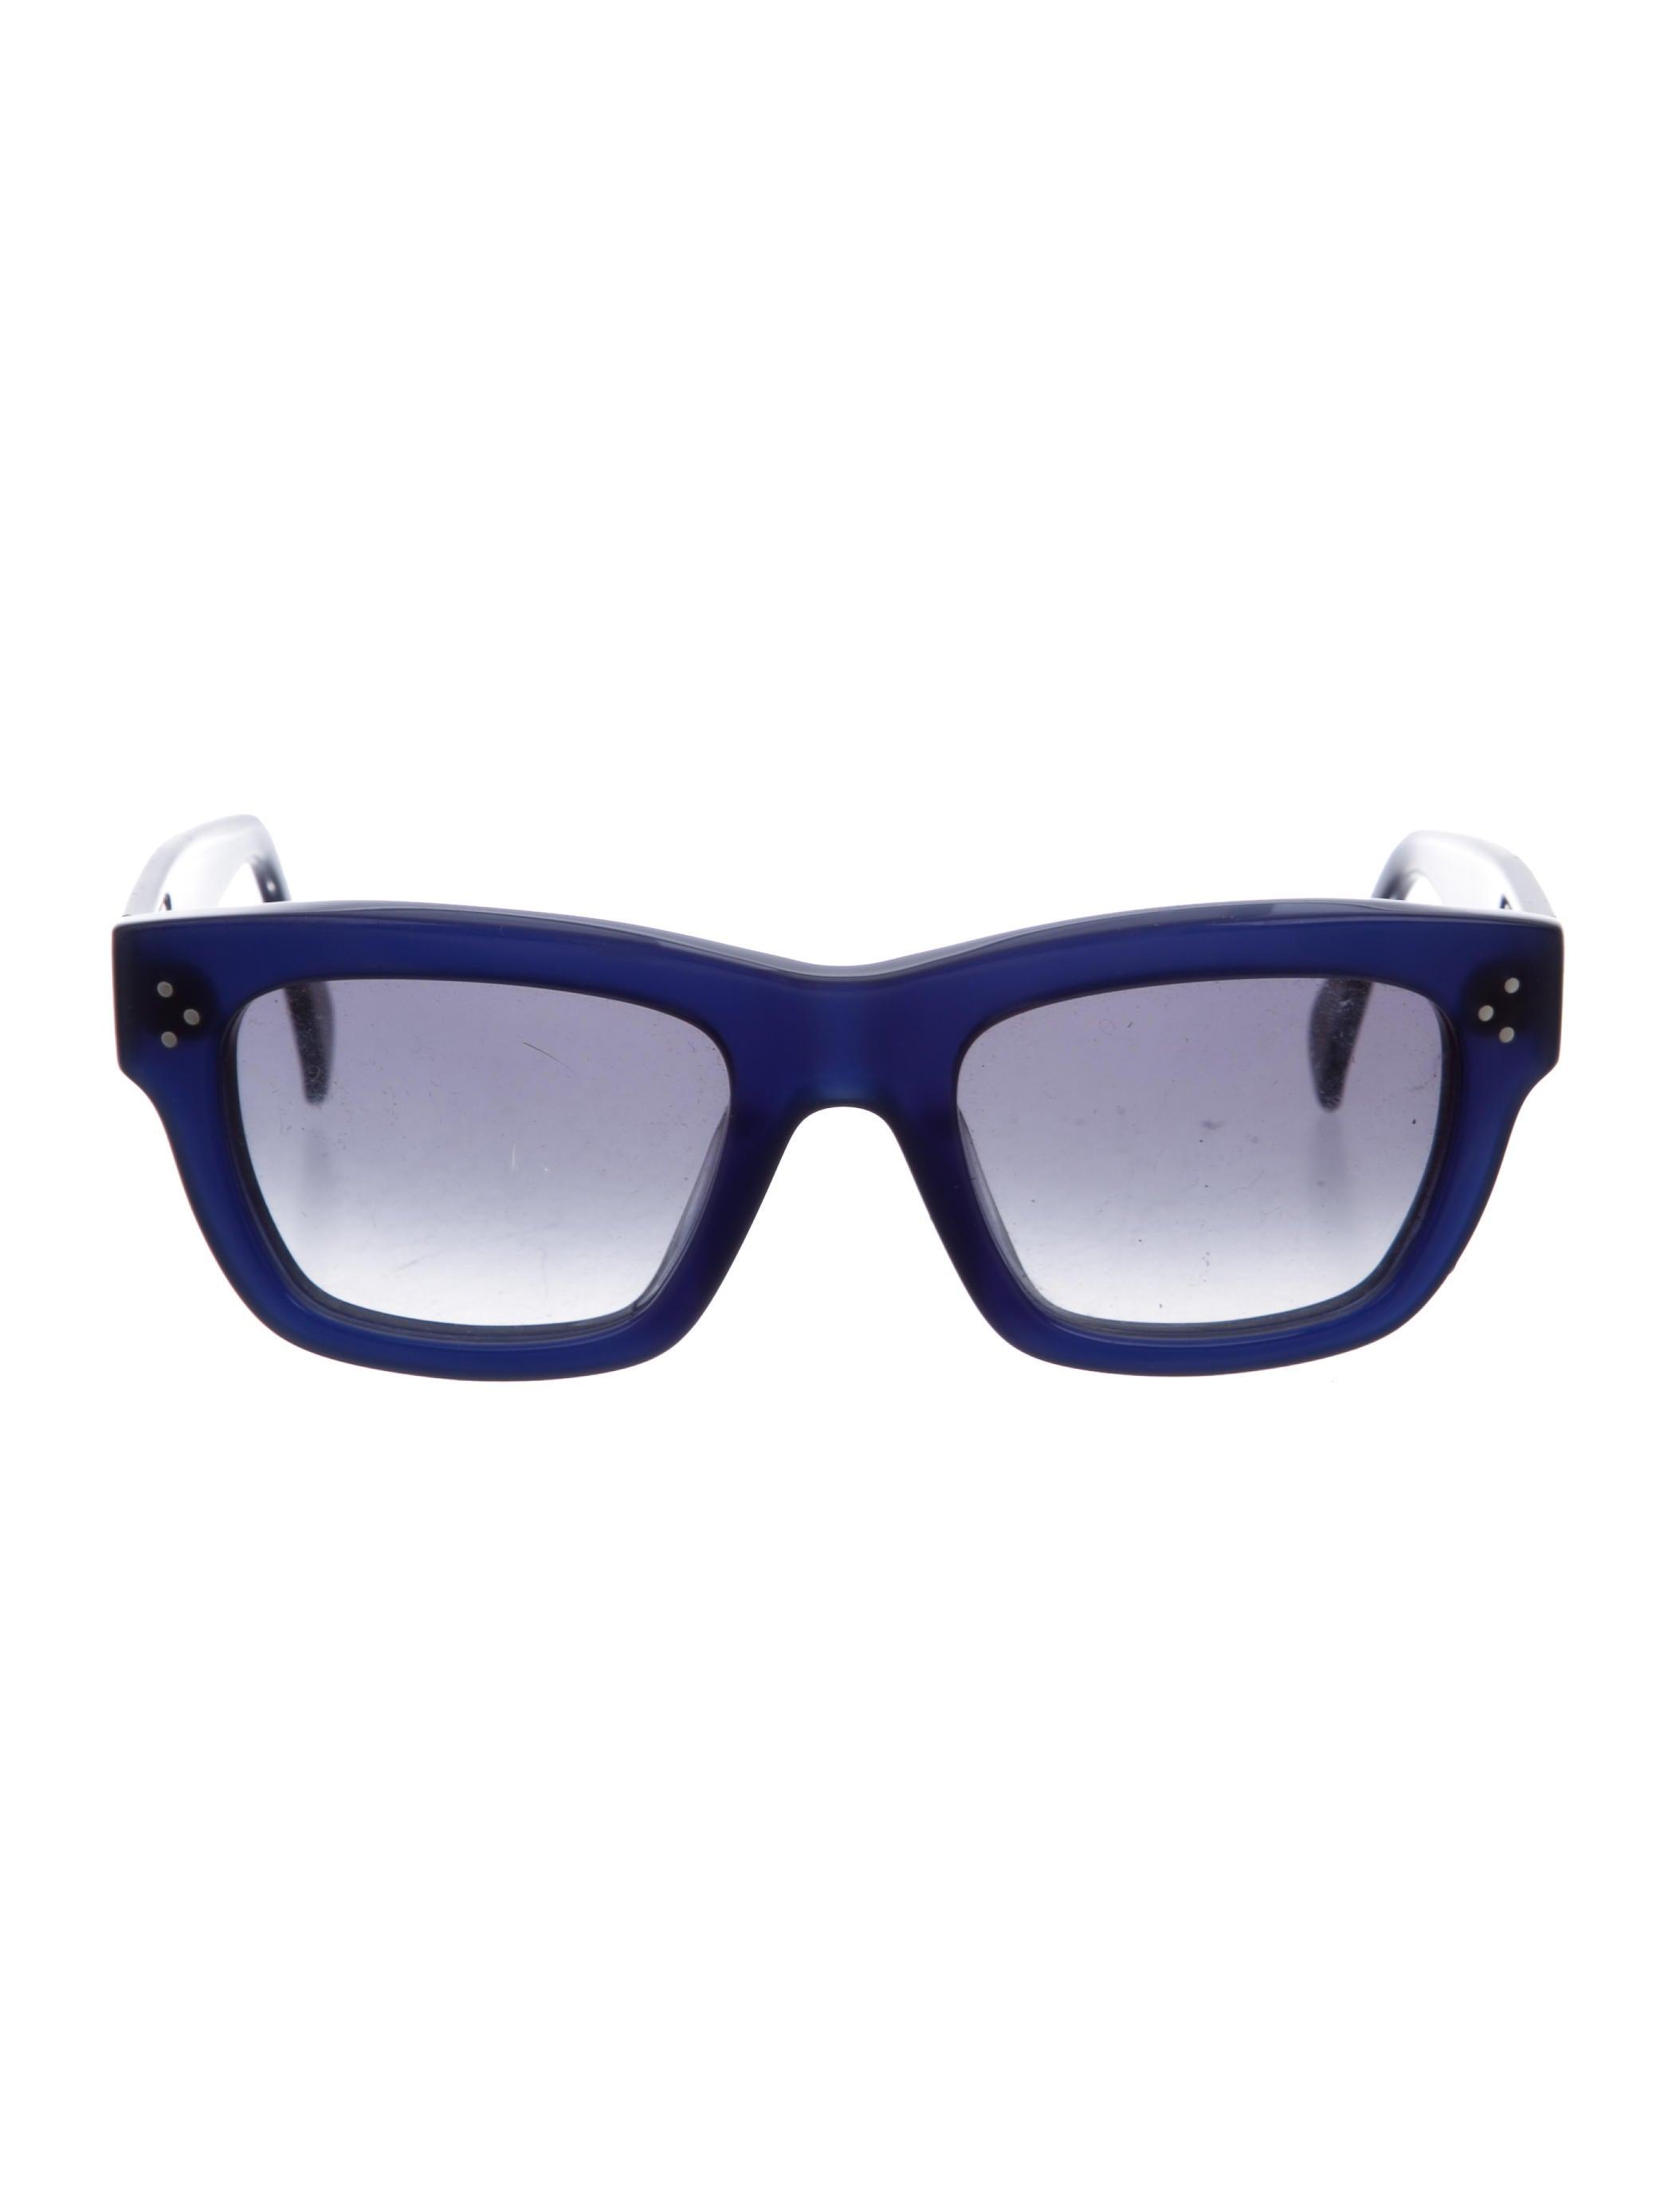 5c102260b6 Women · Accessories  Céline Oversize Tinted Sunglasses. Oversize Tinted  Sunglasses